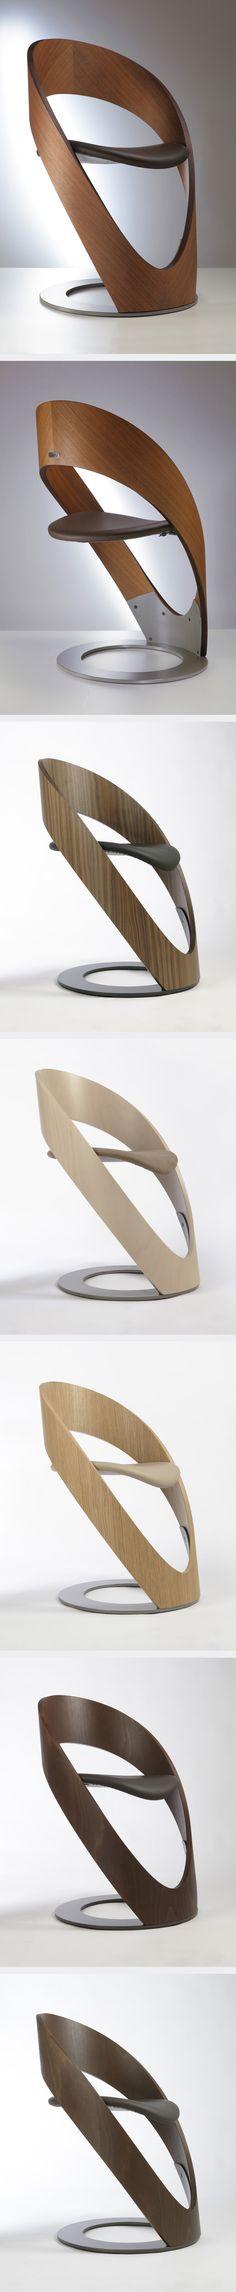 Martz Edition :: Chaise bois assise cuir [Futuristic Furniture: http://futuristicshop.com/category/futuristic-furniture/]